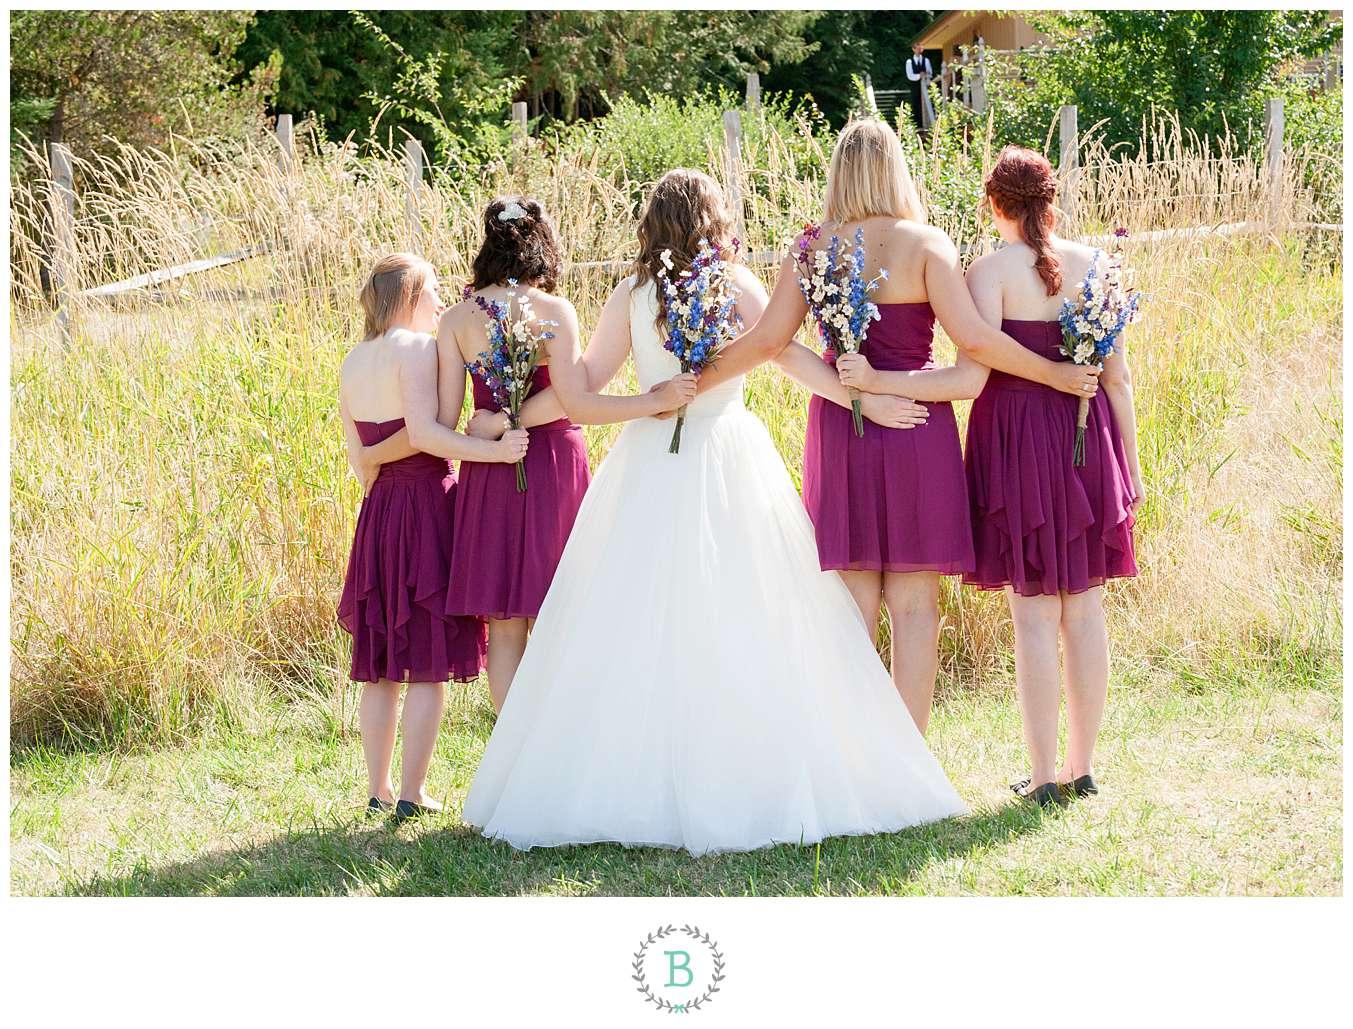 B-Jones-Photography-Seattle-Wedding-Photographer_0805.jpg